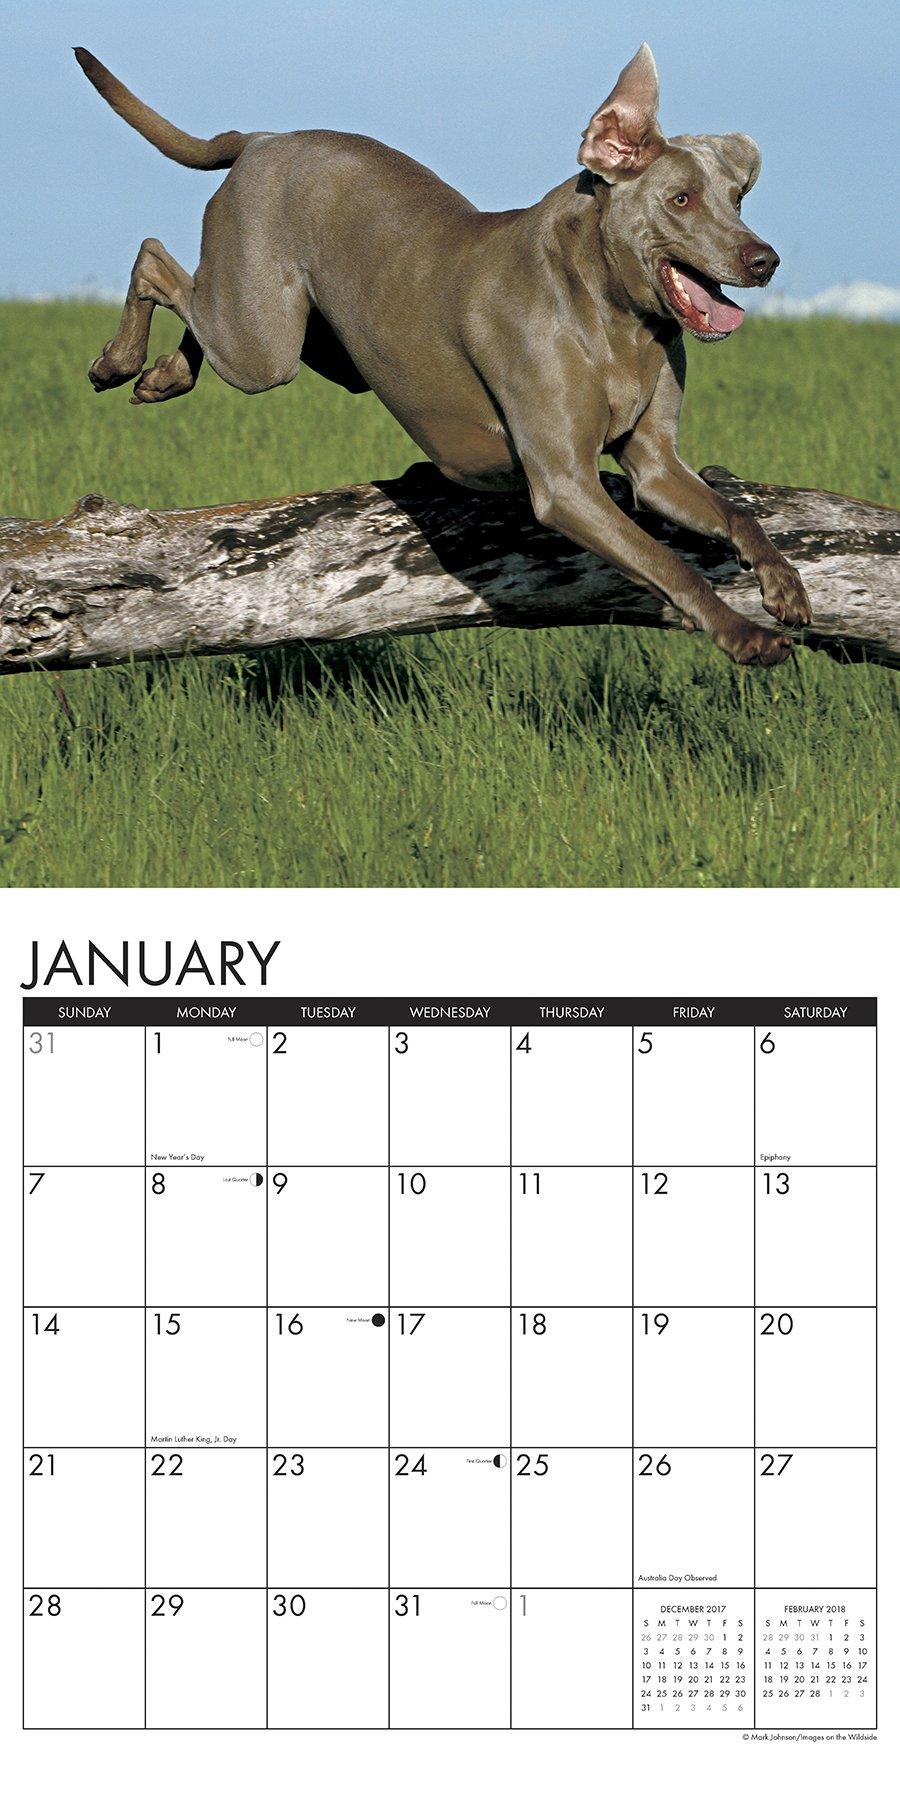 Just weimaraners 2018 wall calendar dog breed calendar willow just weimaraners 2018 wall calendar dog breed calendar willow creek press 9781682346372 amazon books nvjuhfo Image collections